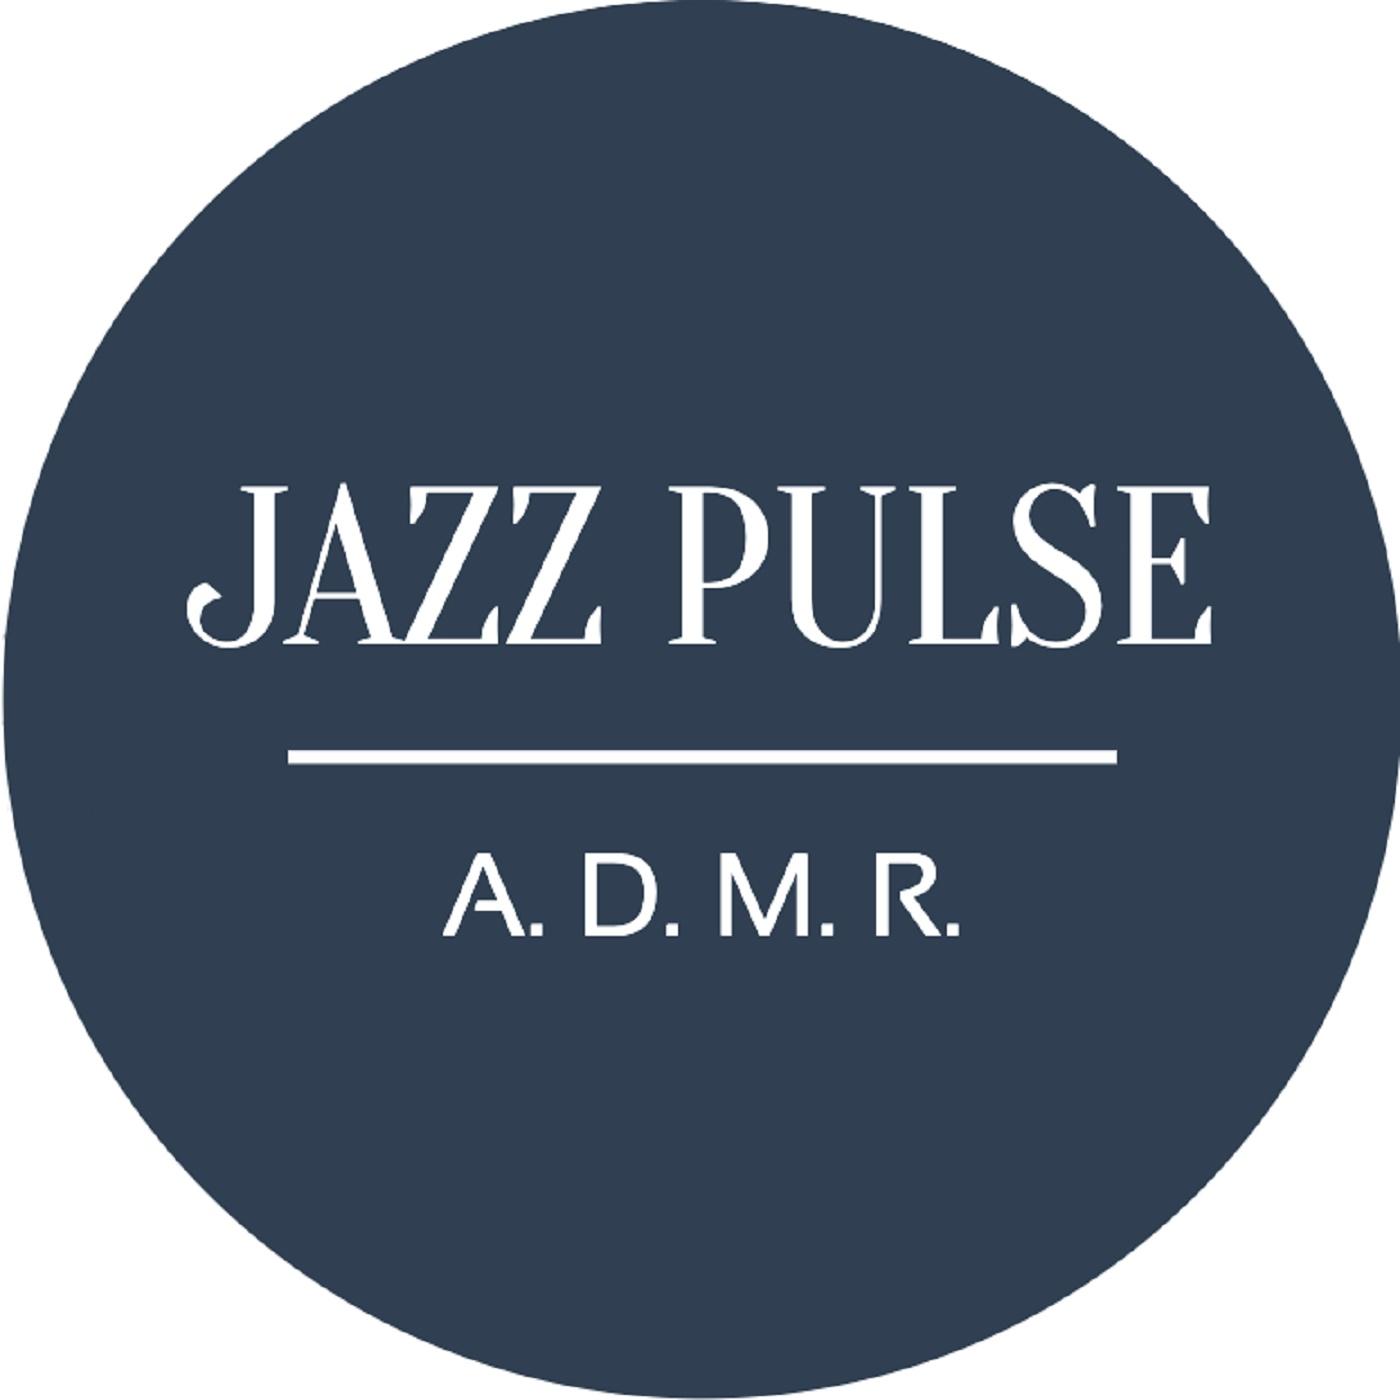 Artwork for podcast Jazz Pulse